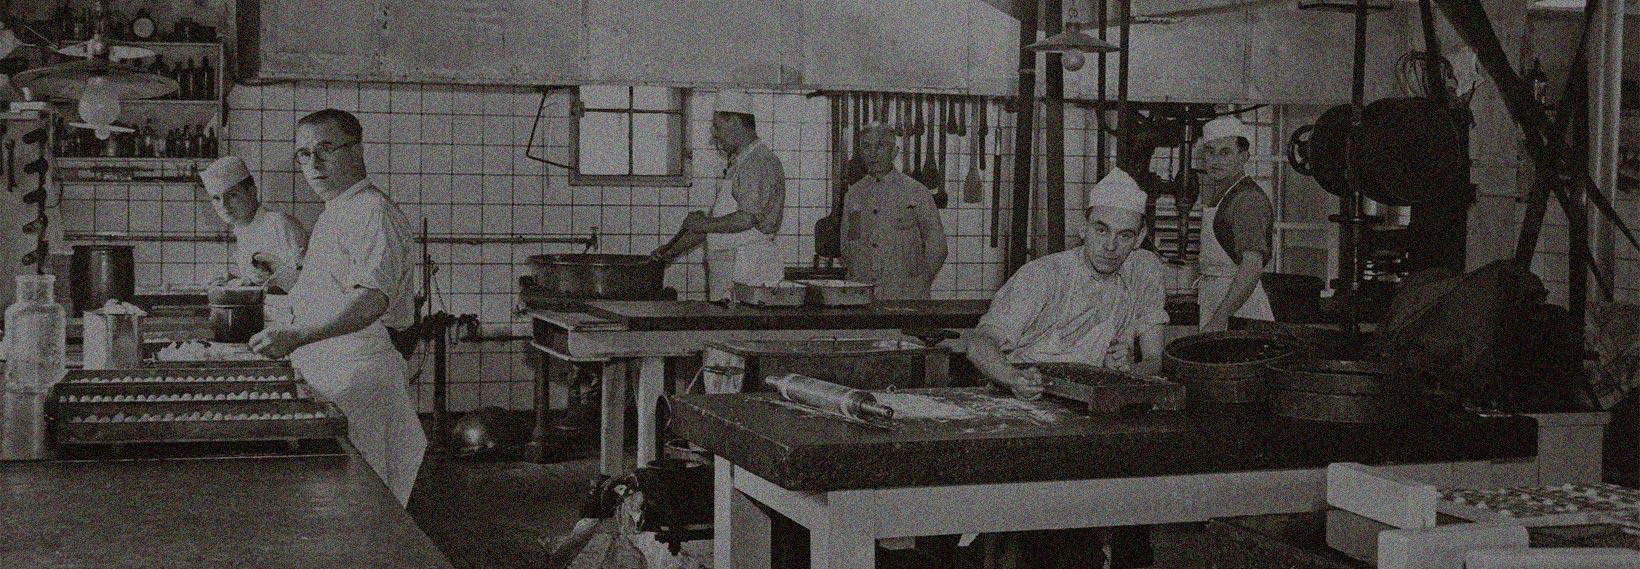 factoryhistory